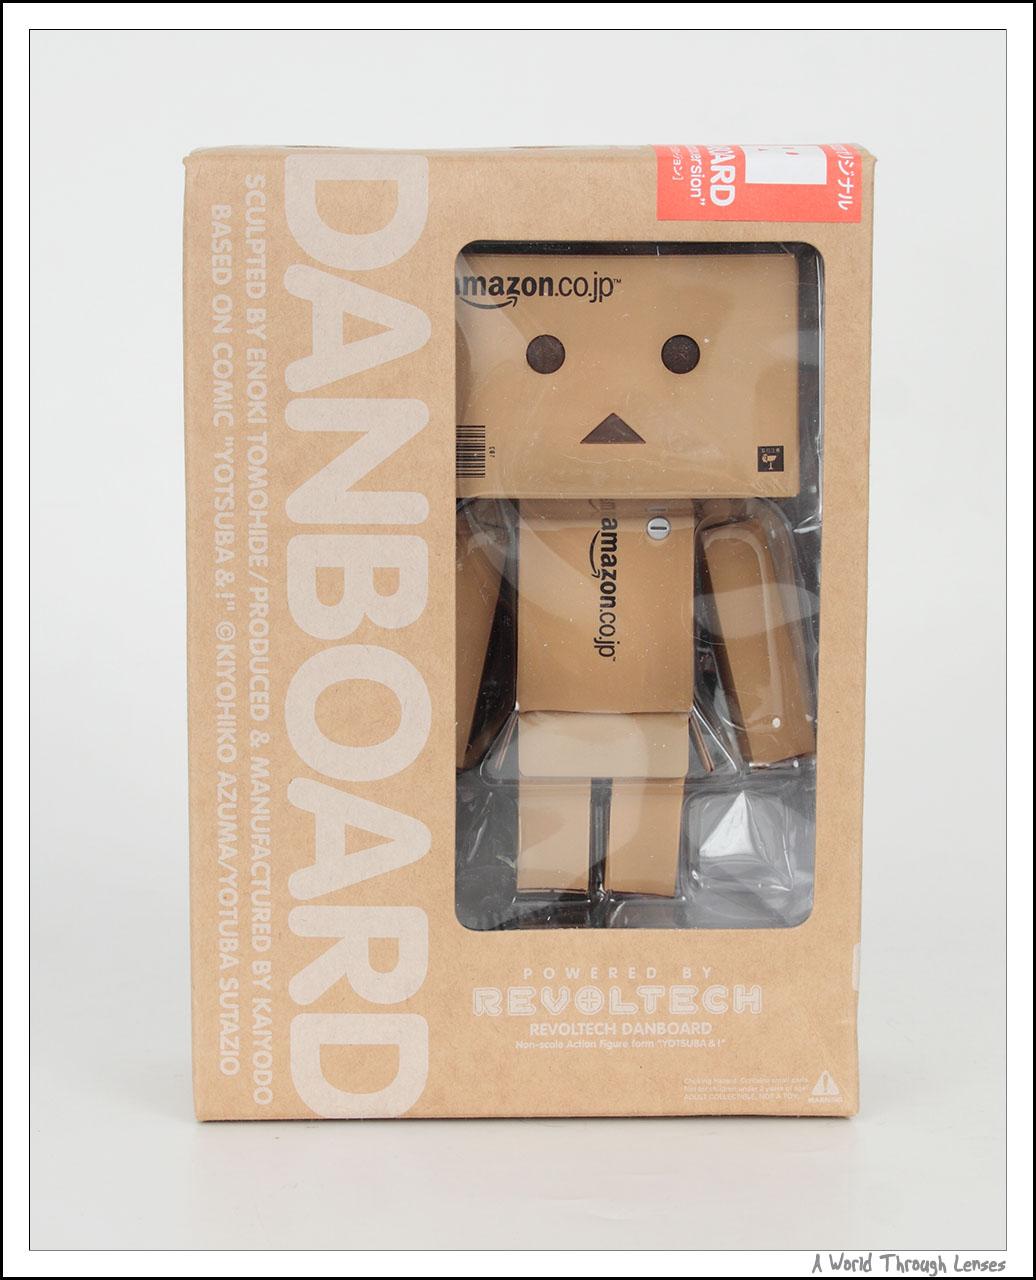 bo cardboard robot reading - photo #10